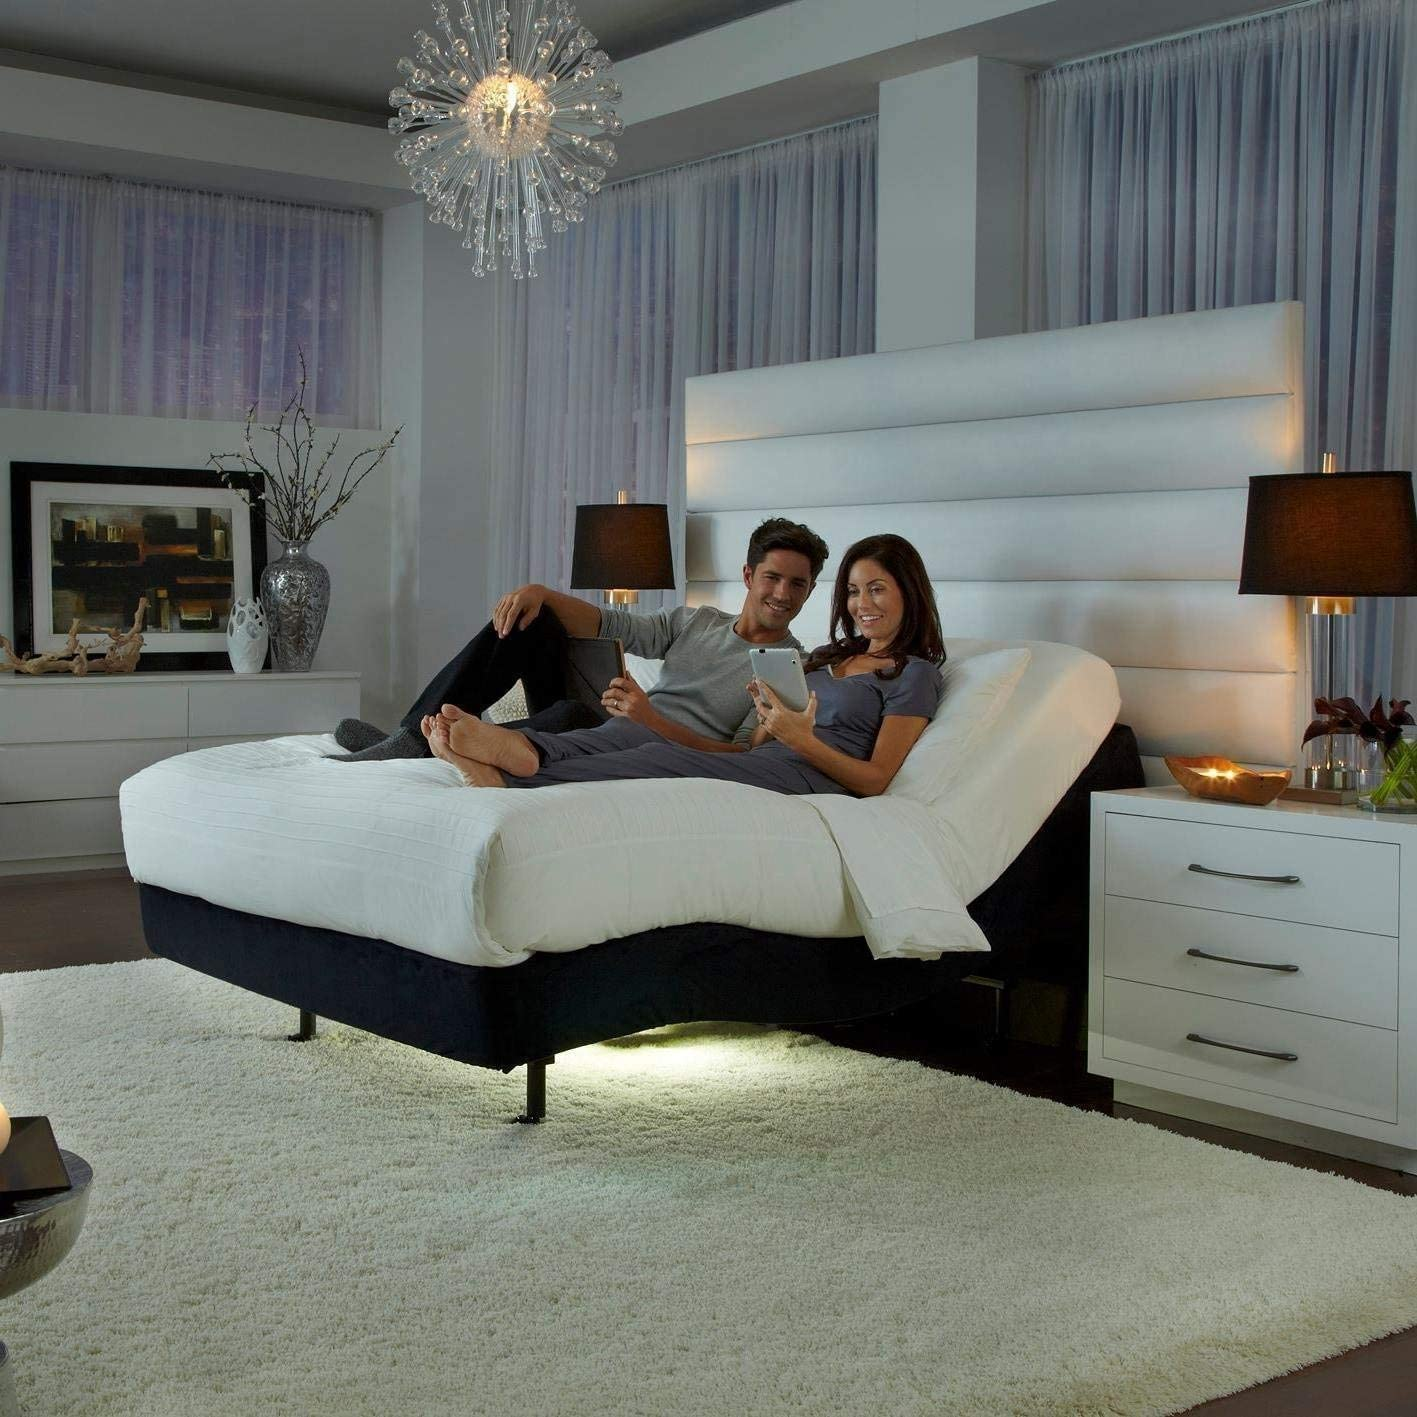 Prodigy Comfort Elite 2019 King Adjustable Bed Frame Individual Lumbar Pillow-Tilt 12 Luxury Cool Gel Memory Foam Adjustable Beds and Mattresse